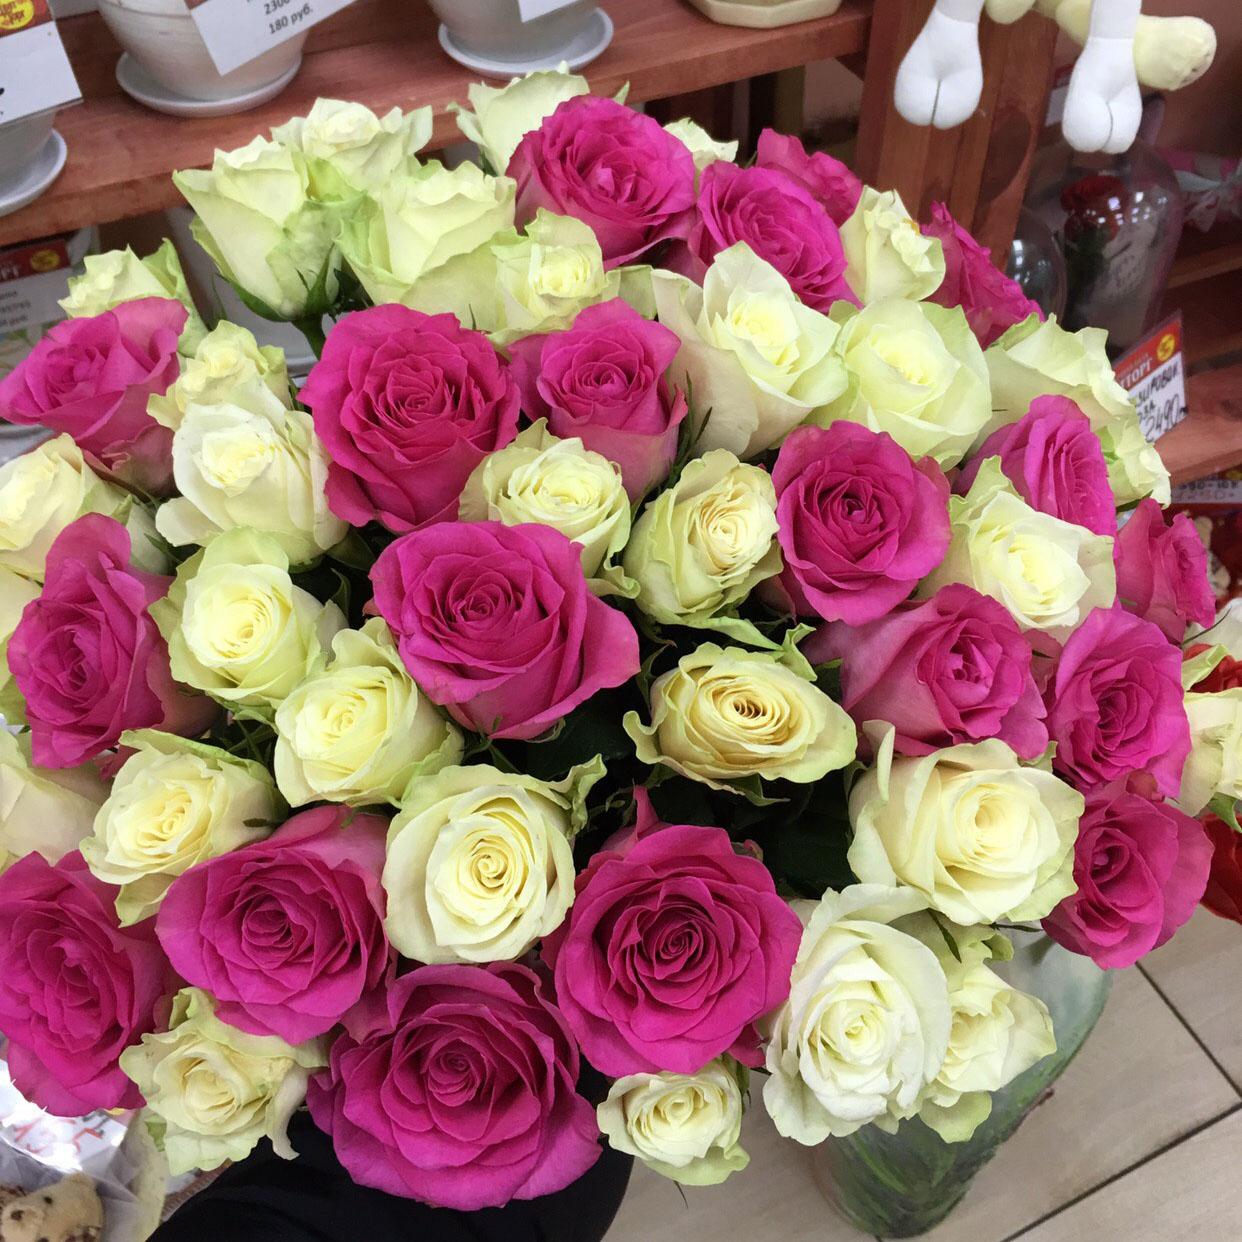 Доставка, доставка цветов в митино круглосуточно